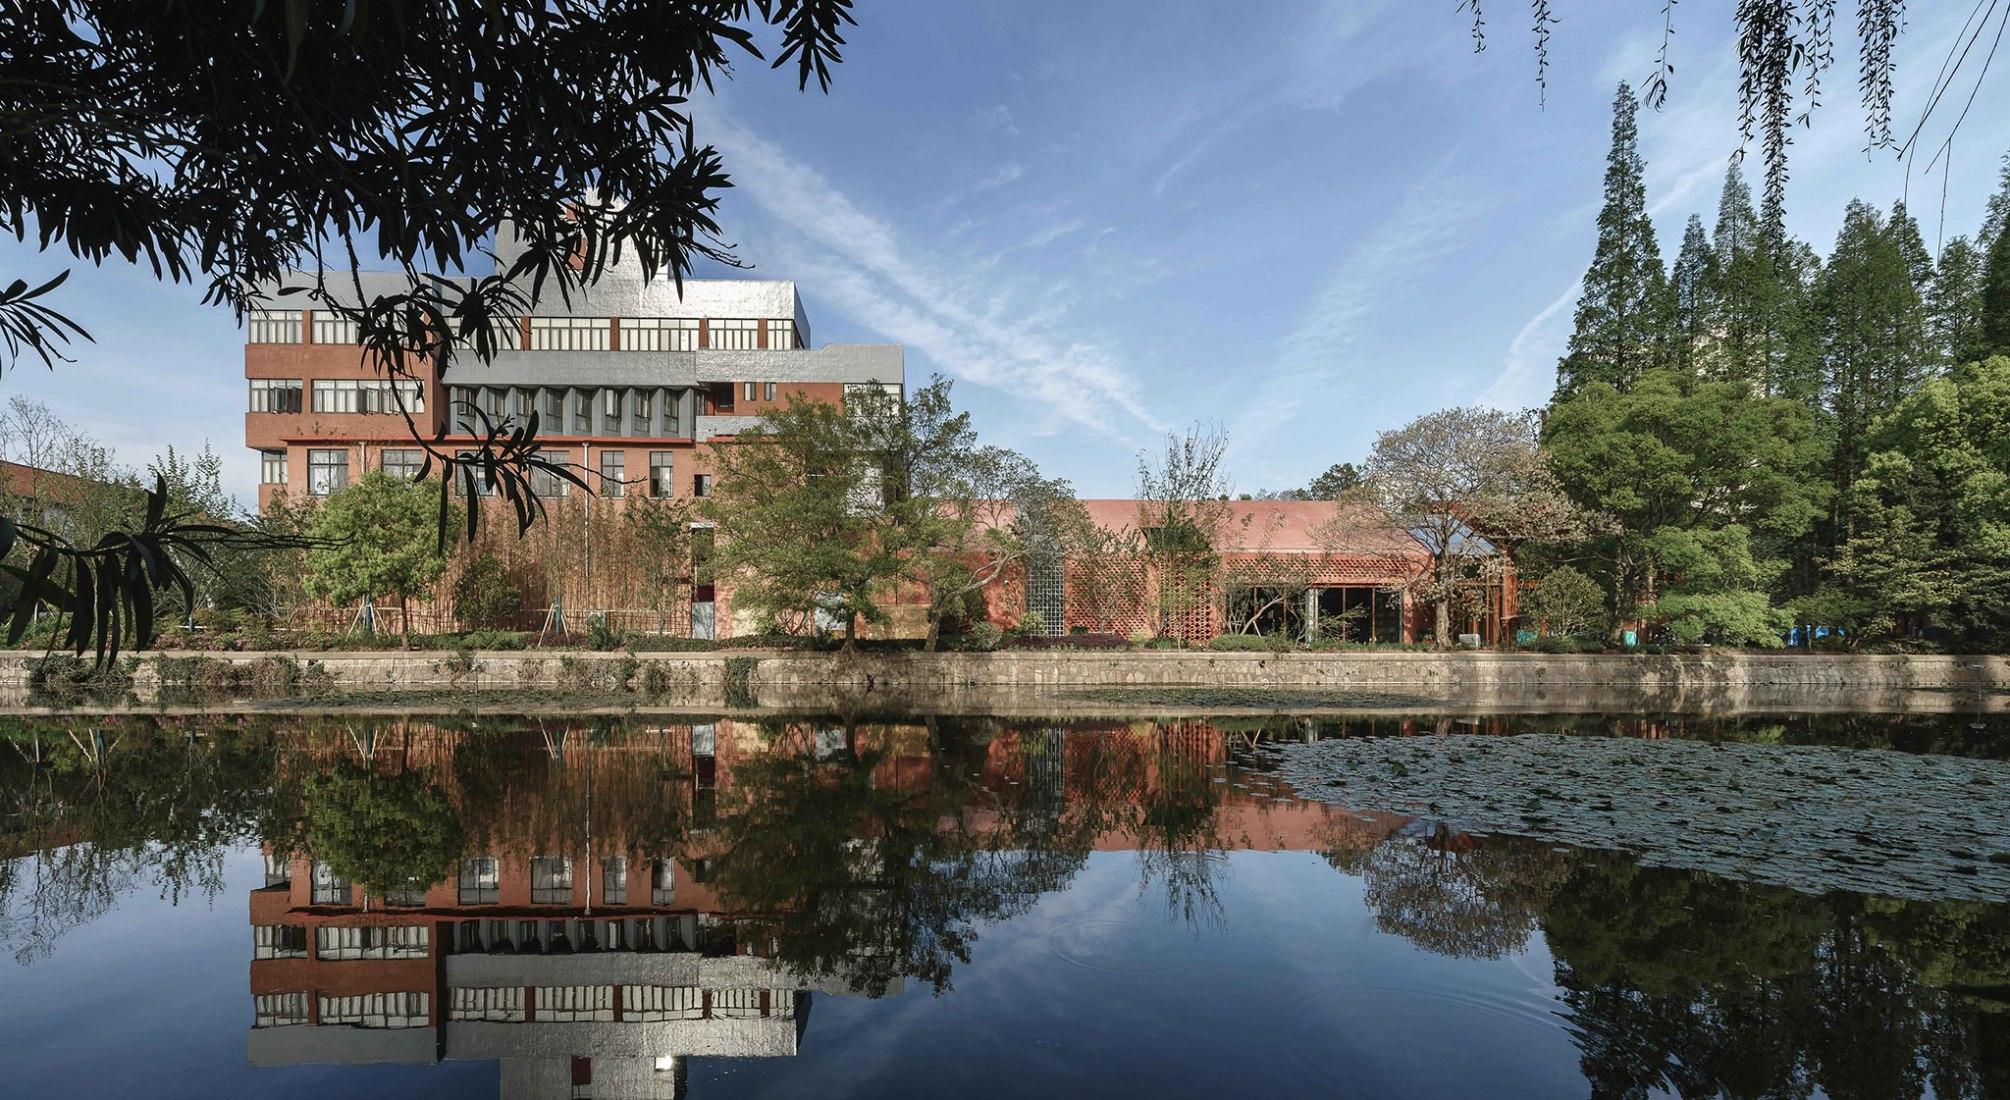 Liva Riverside Book Bar por Lacime Architects. Fotografía por Qianxi Zhang.